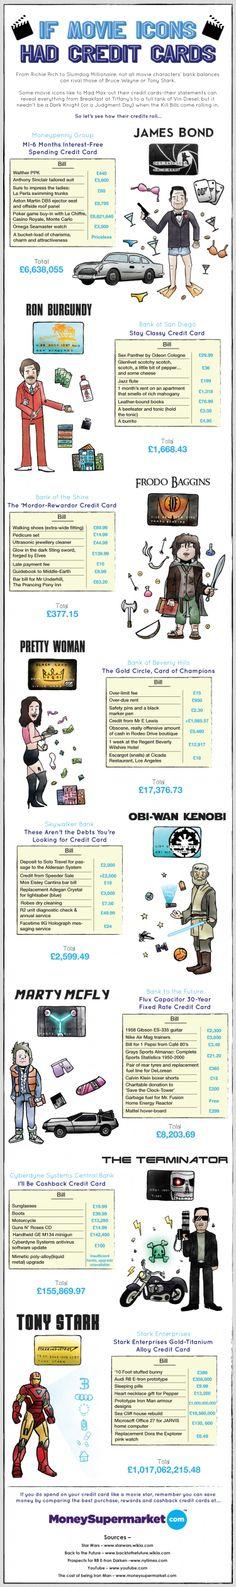 #film budgeting... using a credit card.